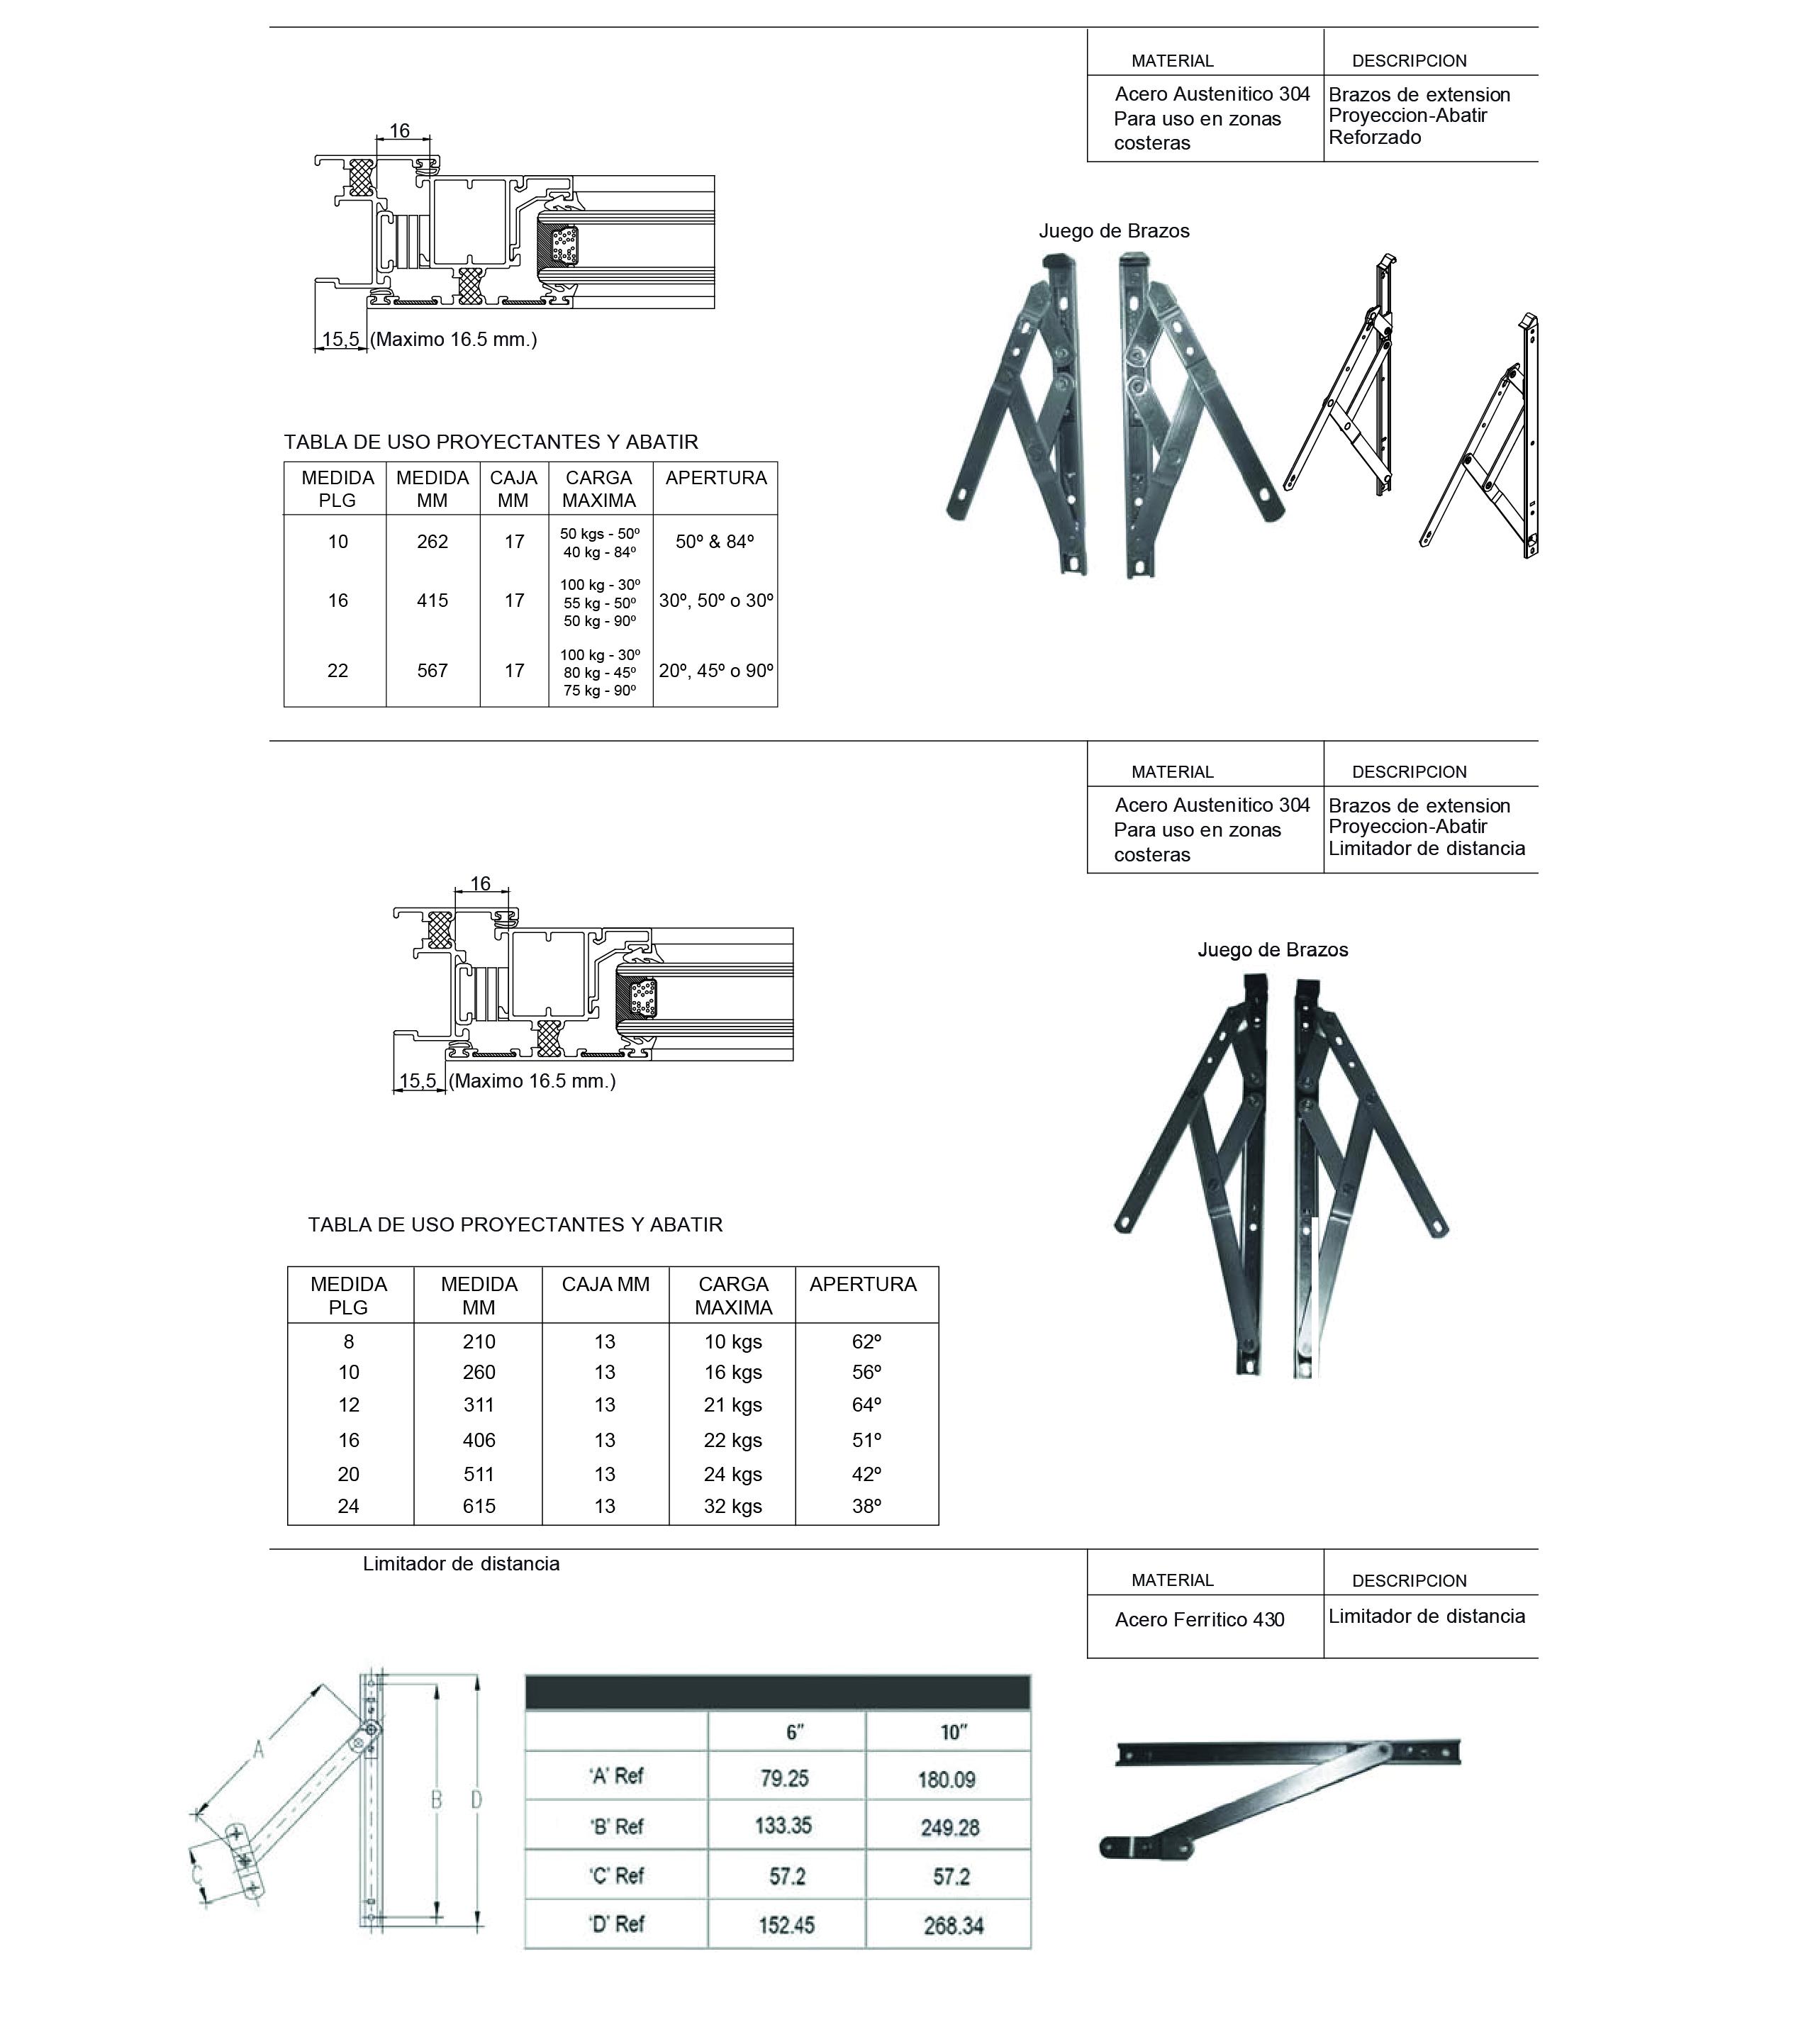 esquema 4 accesorios homologados superior 83 qt